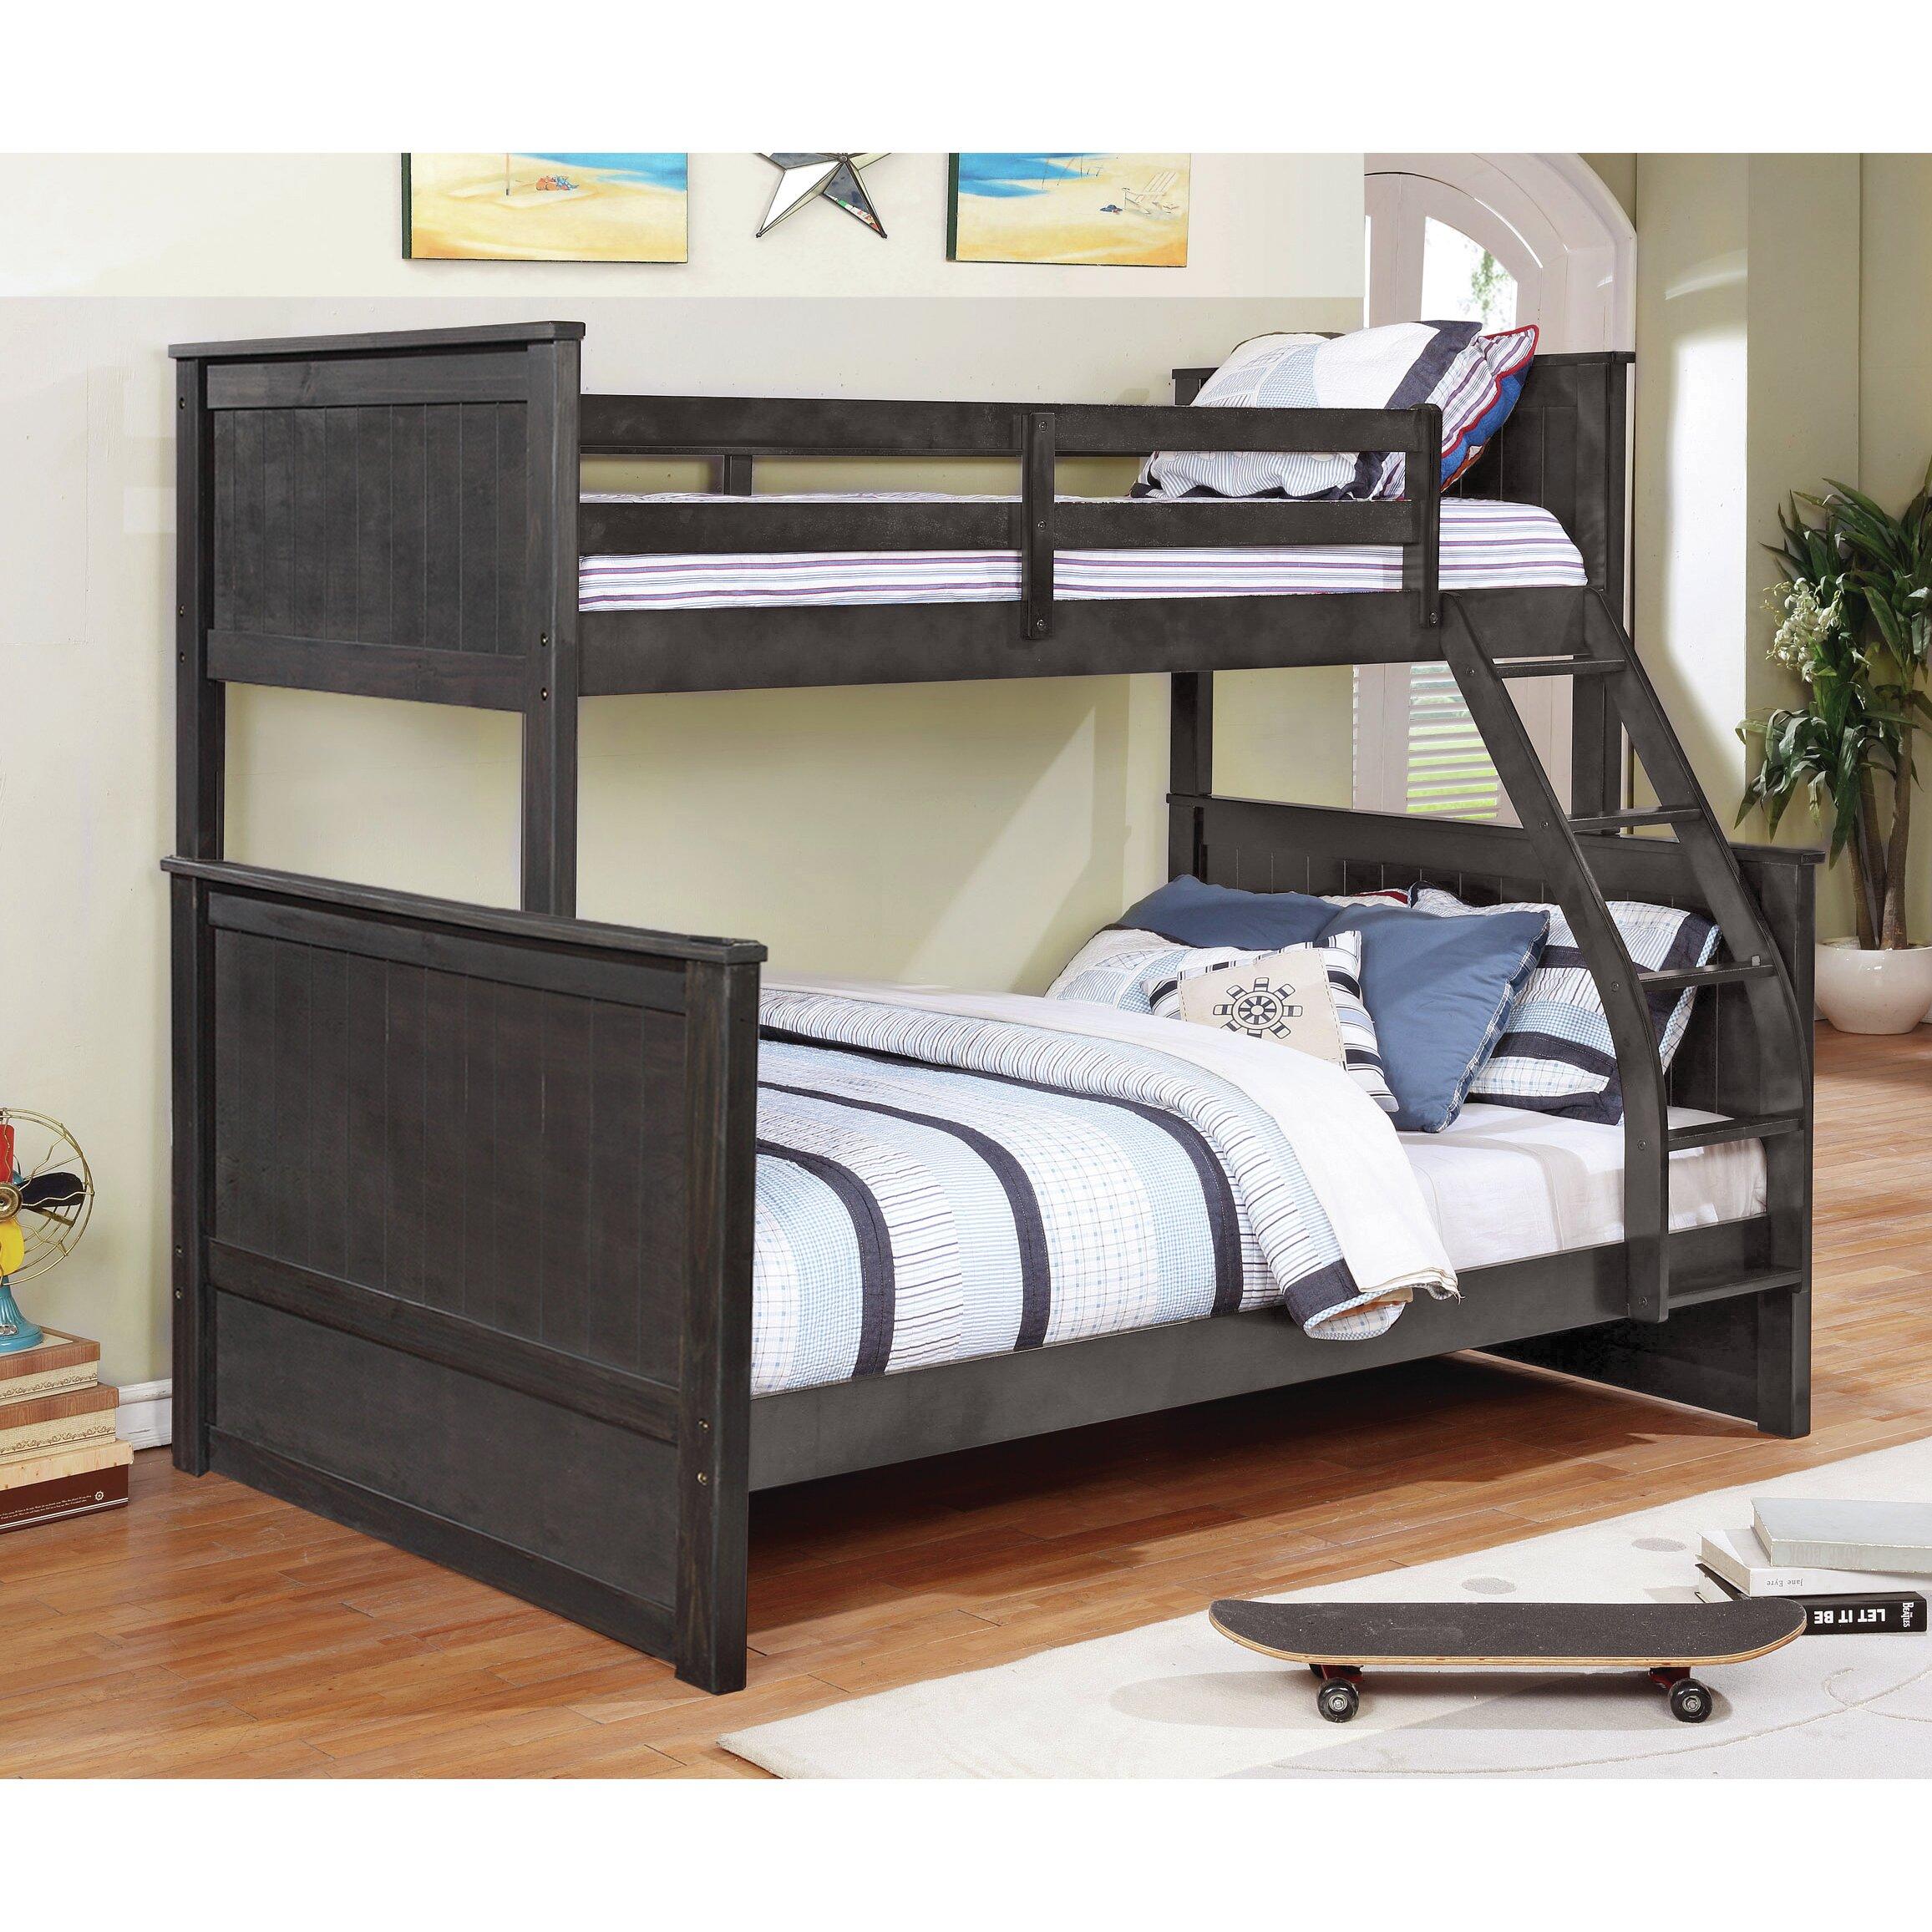 Magnolia Home Hudson Twin Over Full Loft Bunk Bed